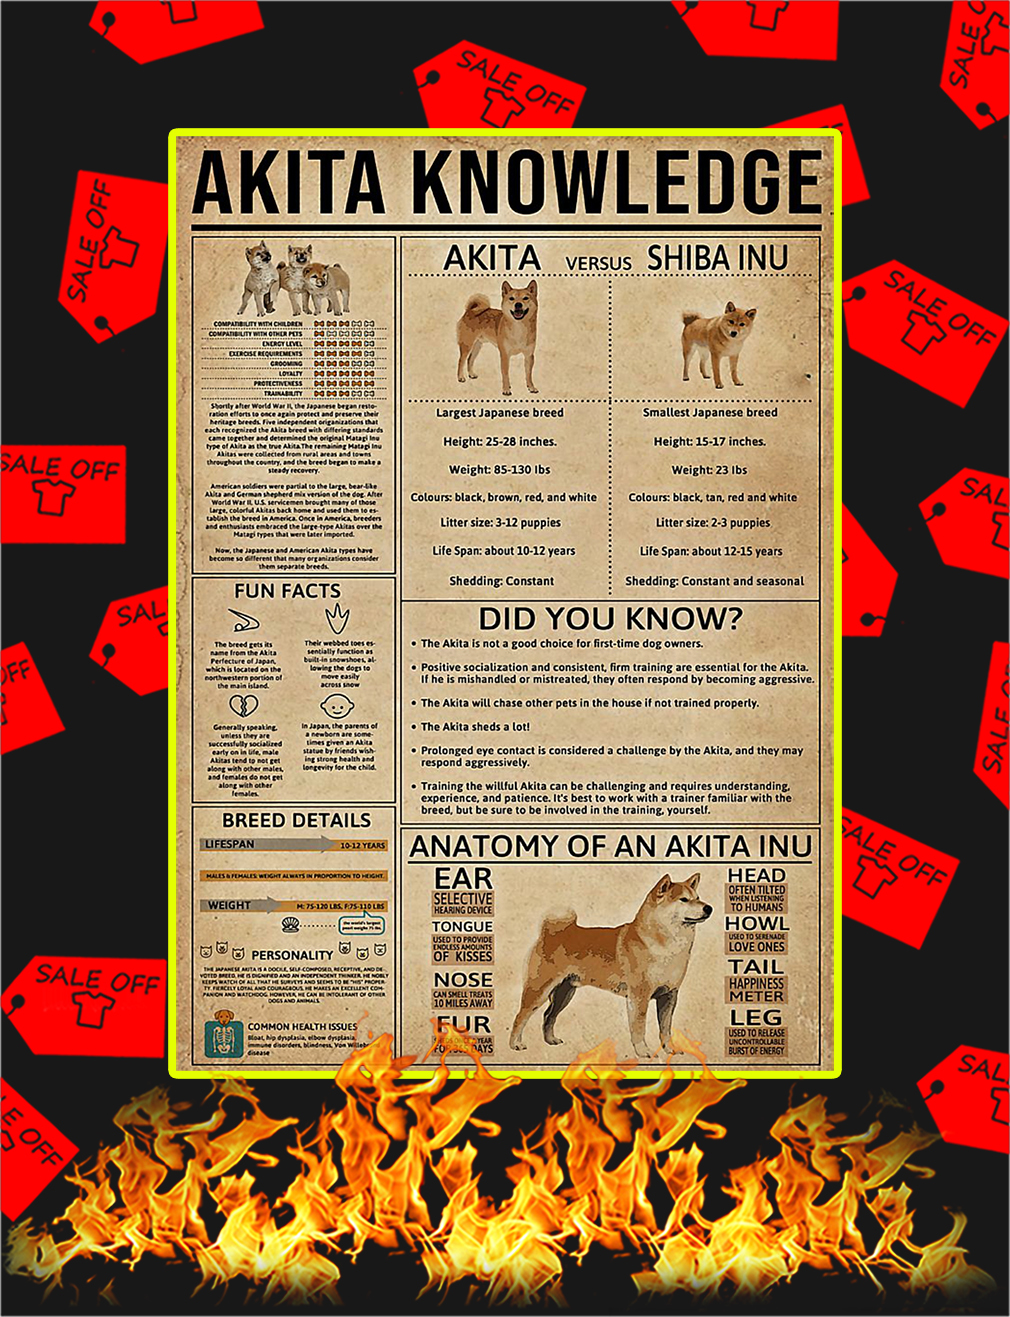 Akita Knowledge Poster - A4